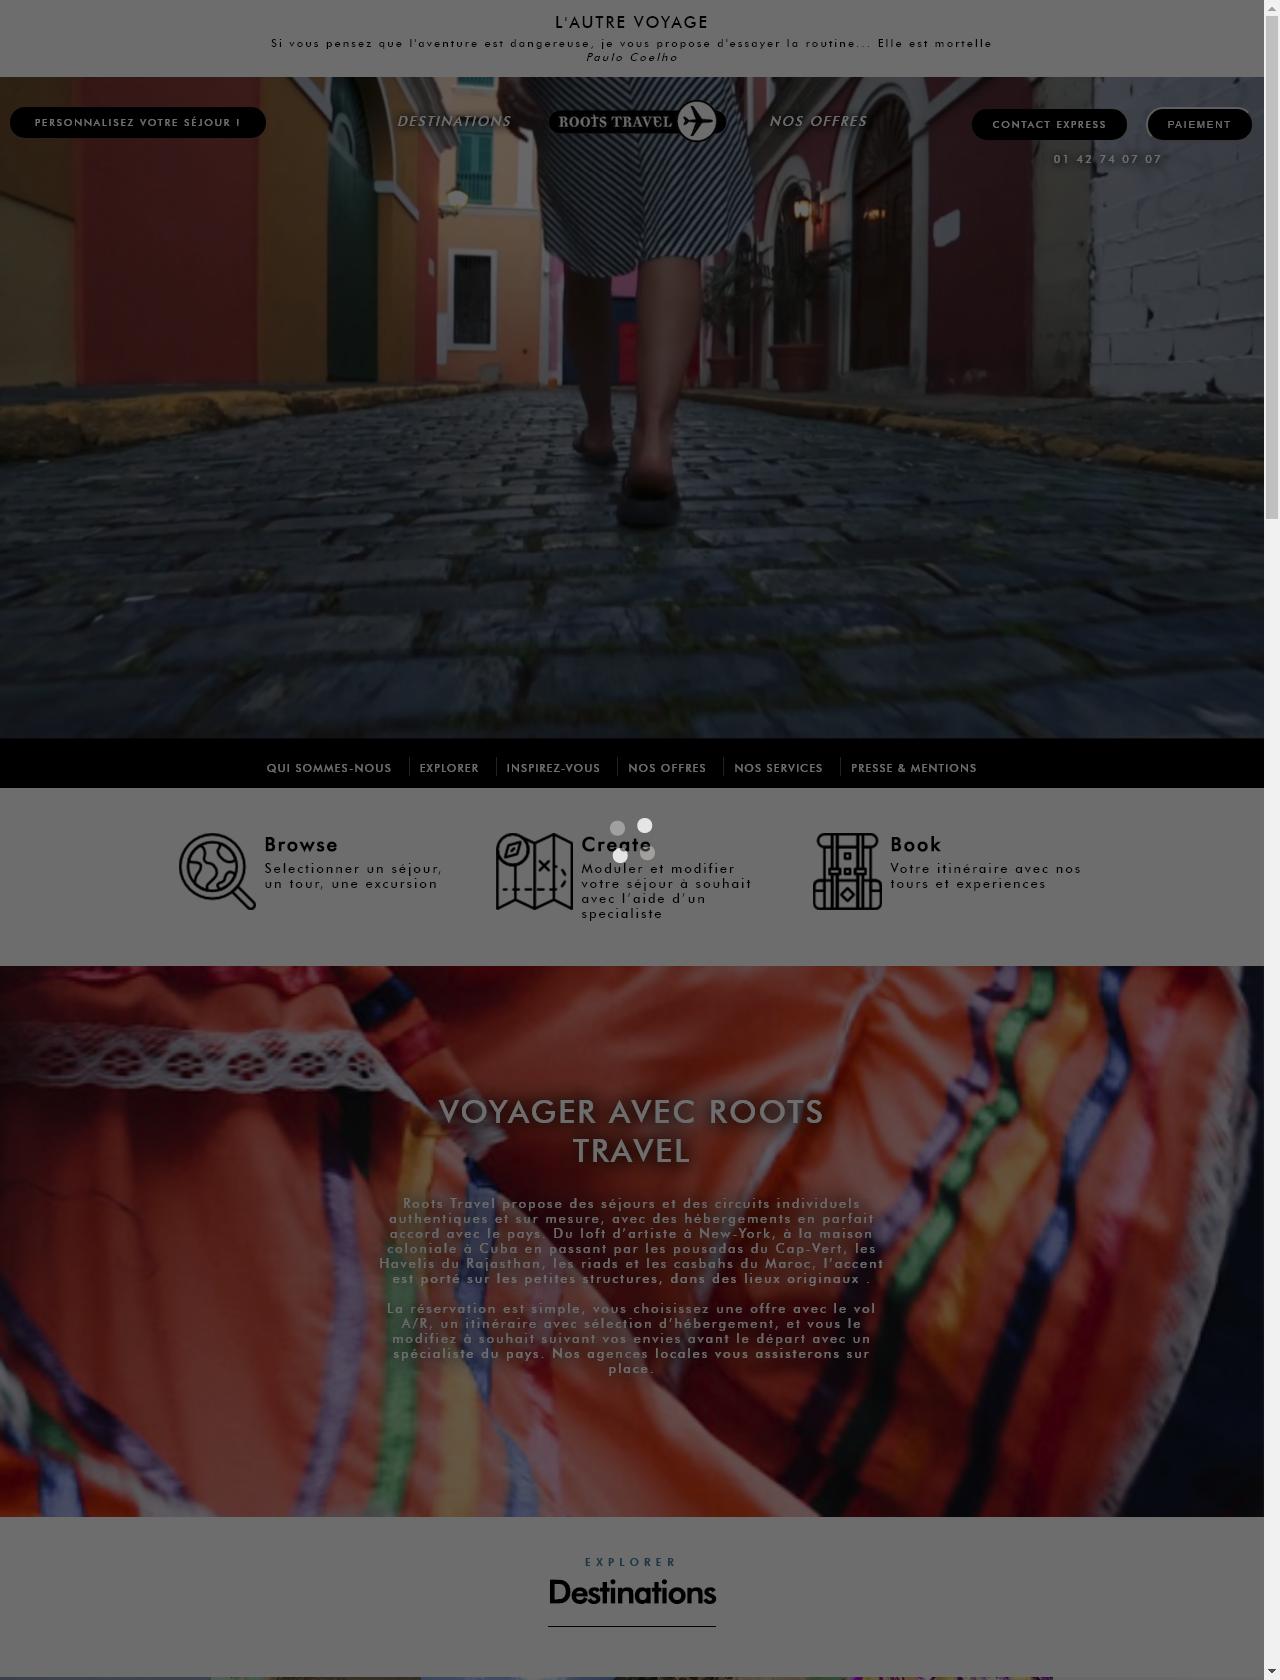 Screenshot Desktop - https://www.rootstravel.com/accueil/